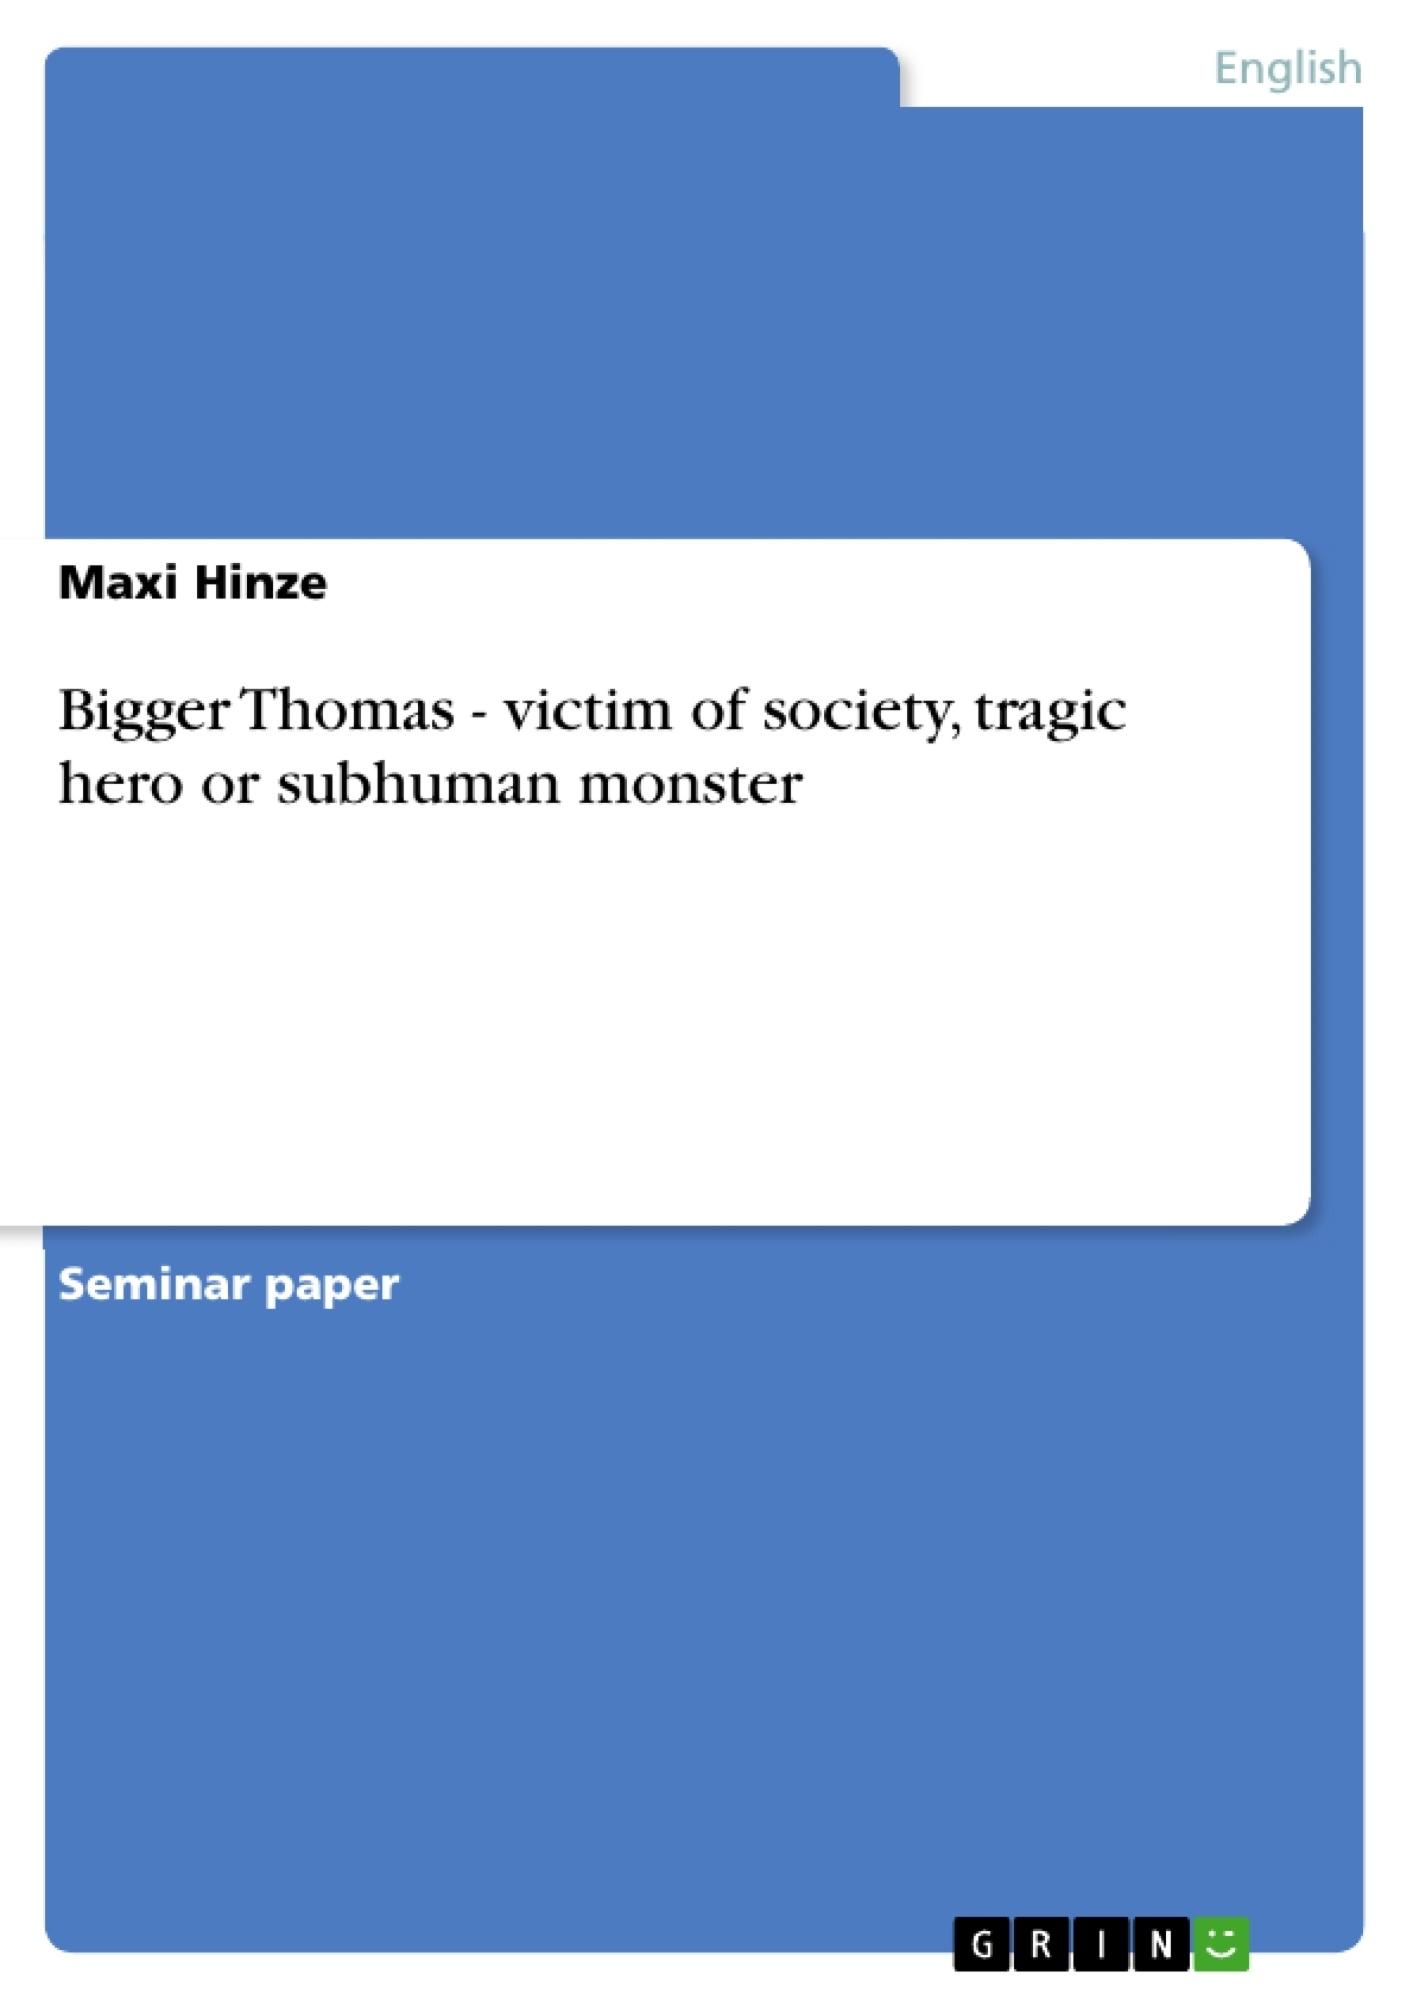 Title: Bigger Thomas - victim of society, tragic hero or subhuman monster